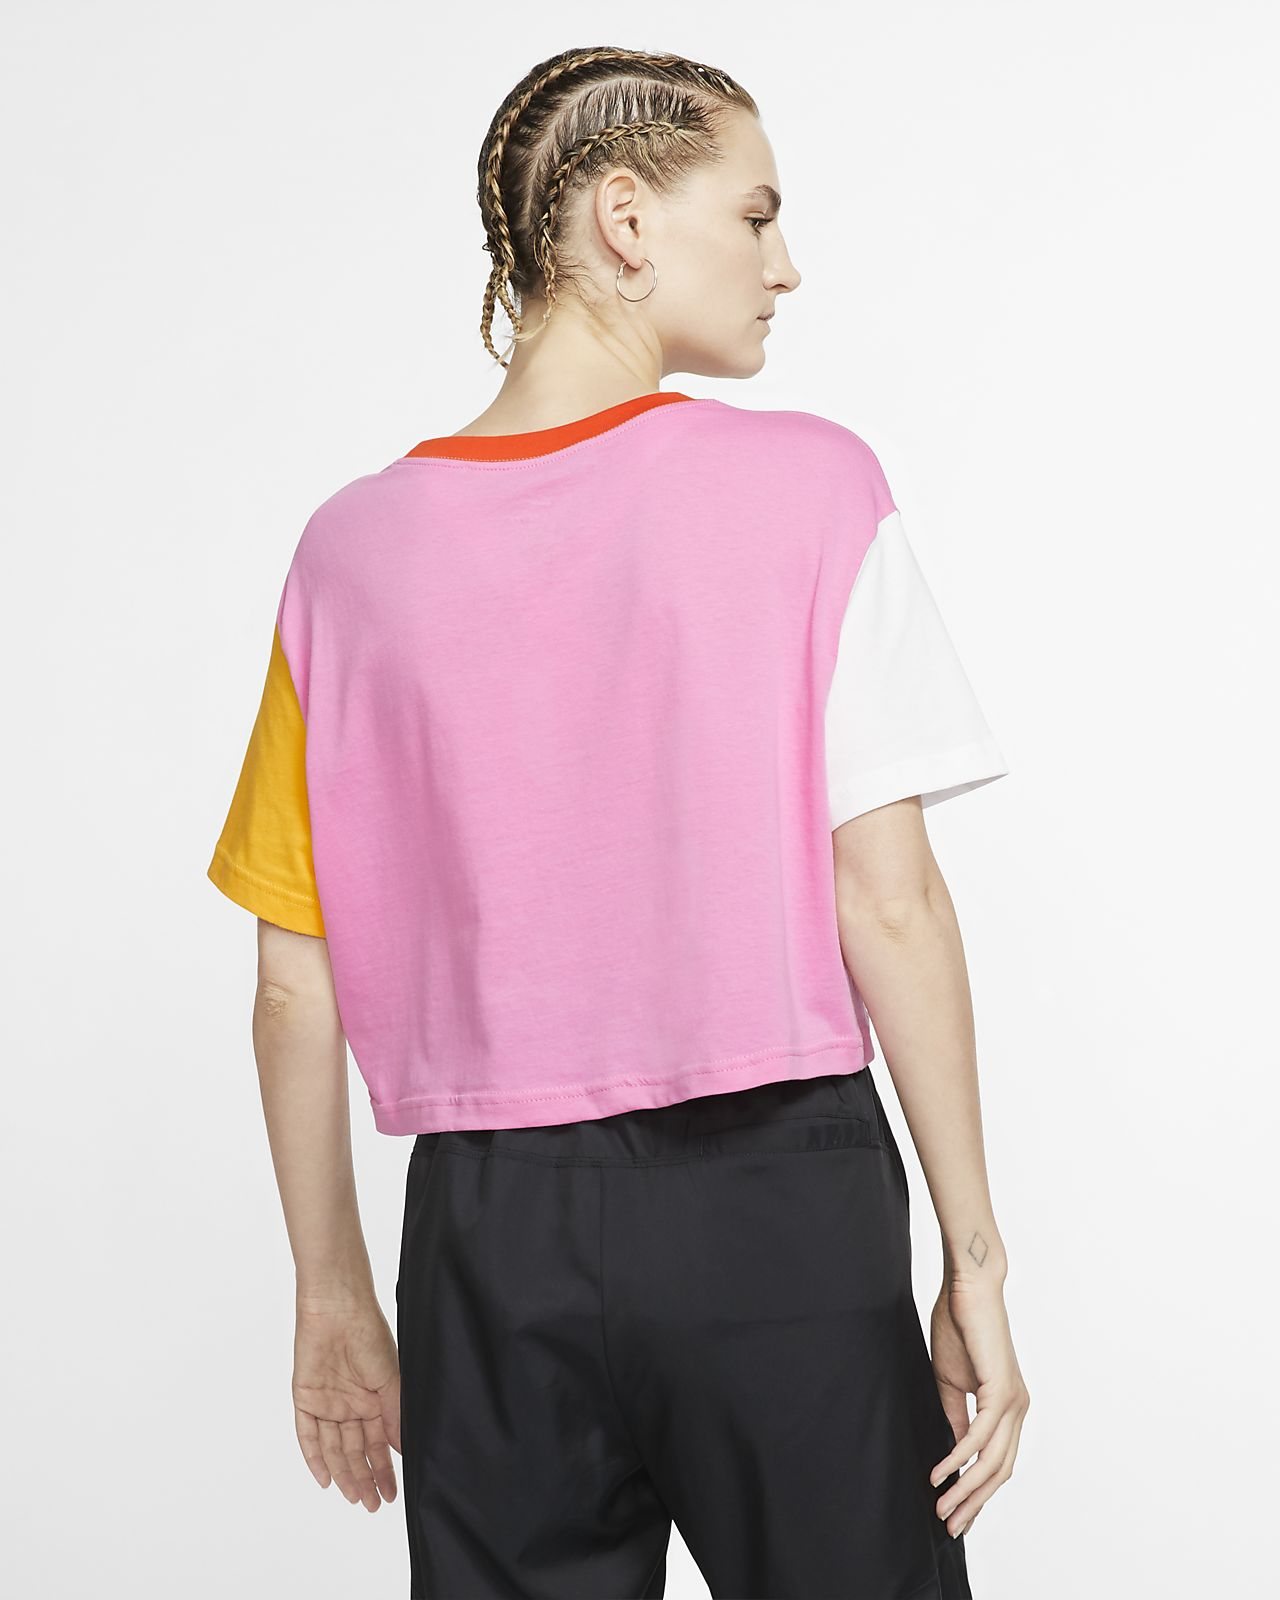 Nike Sportswear Camiseta Corta Sportswear Nike Mujer Corta Mujer Nike Camiseta vnN8m0w